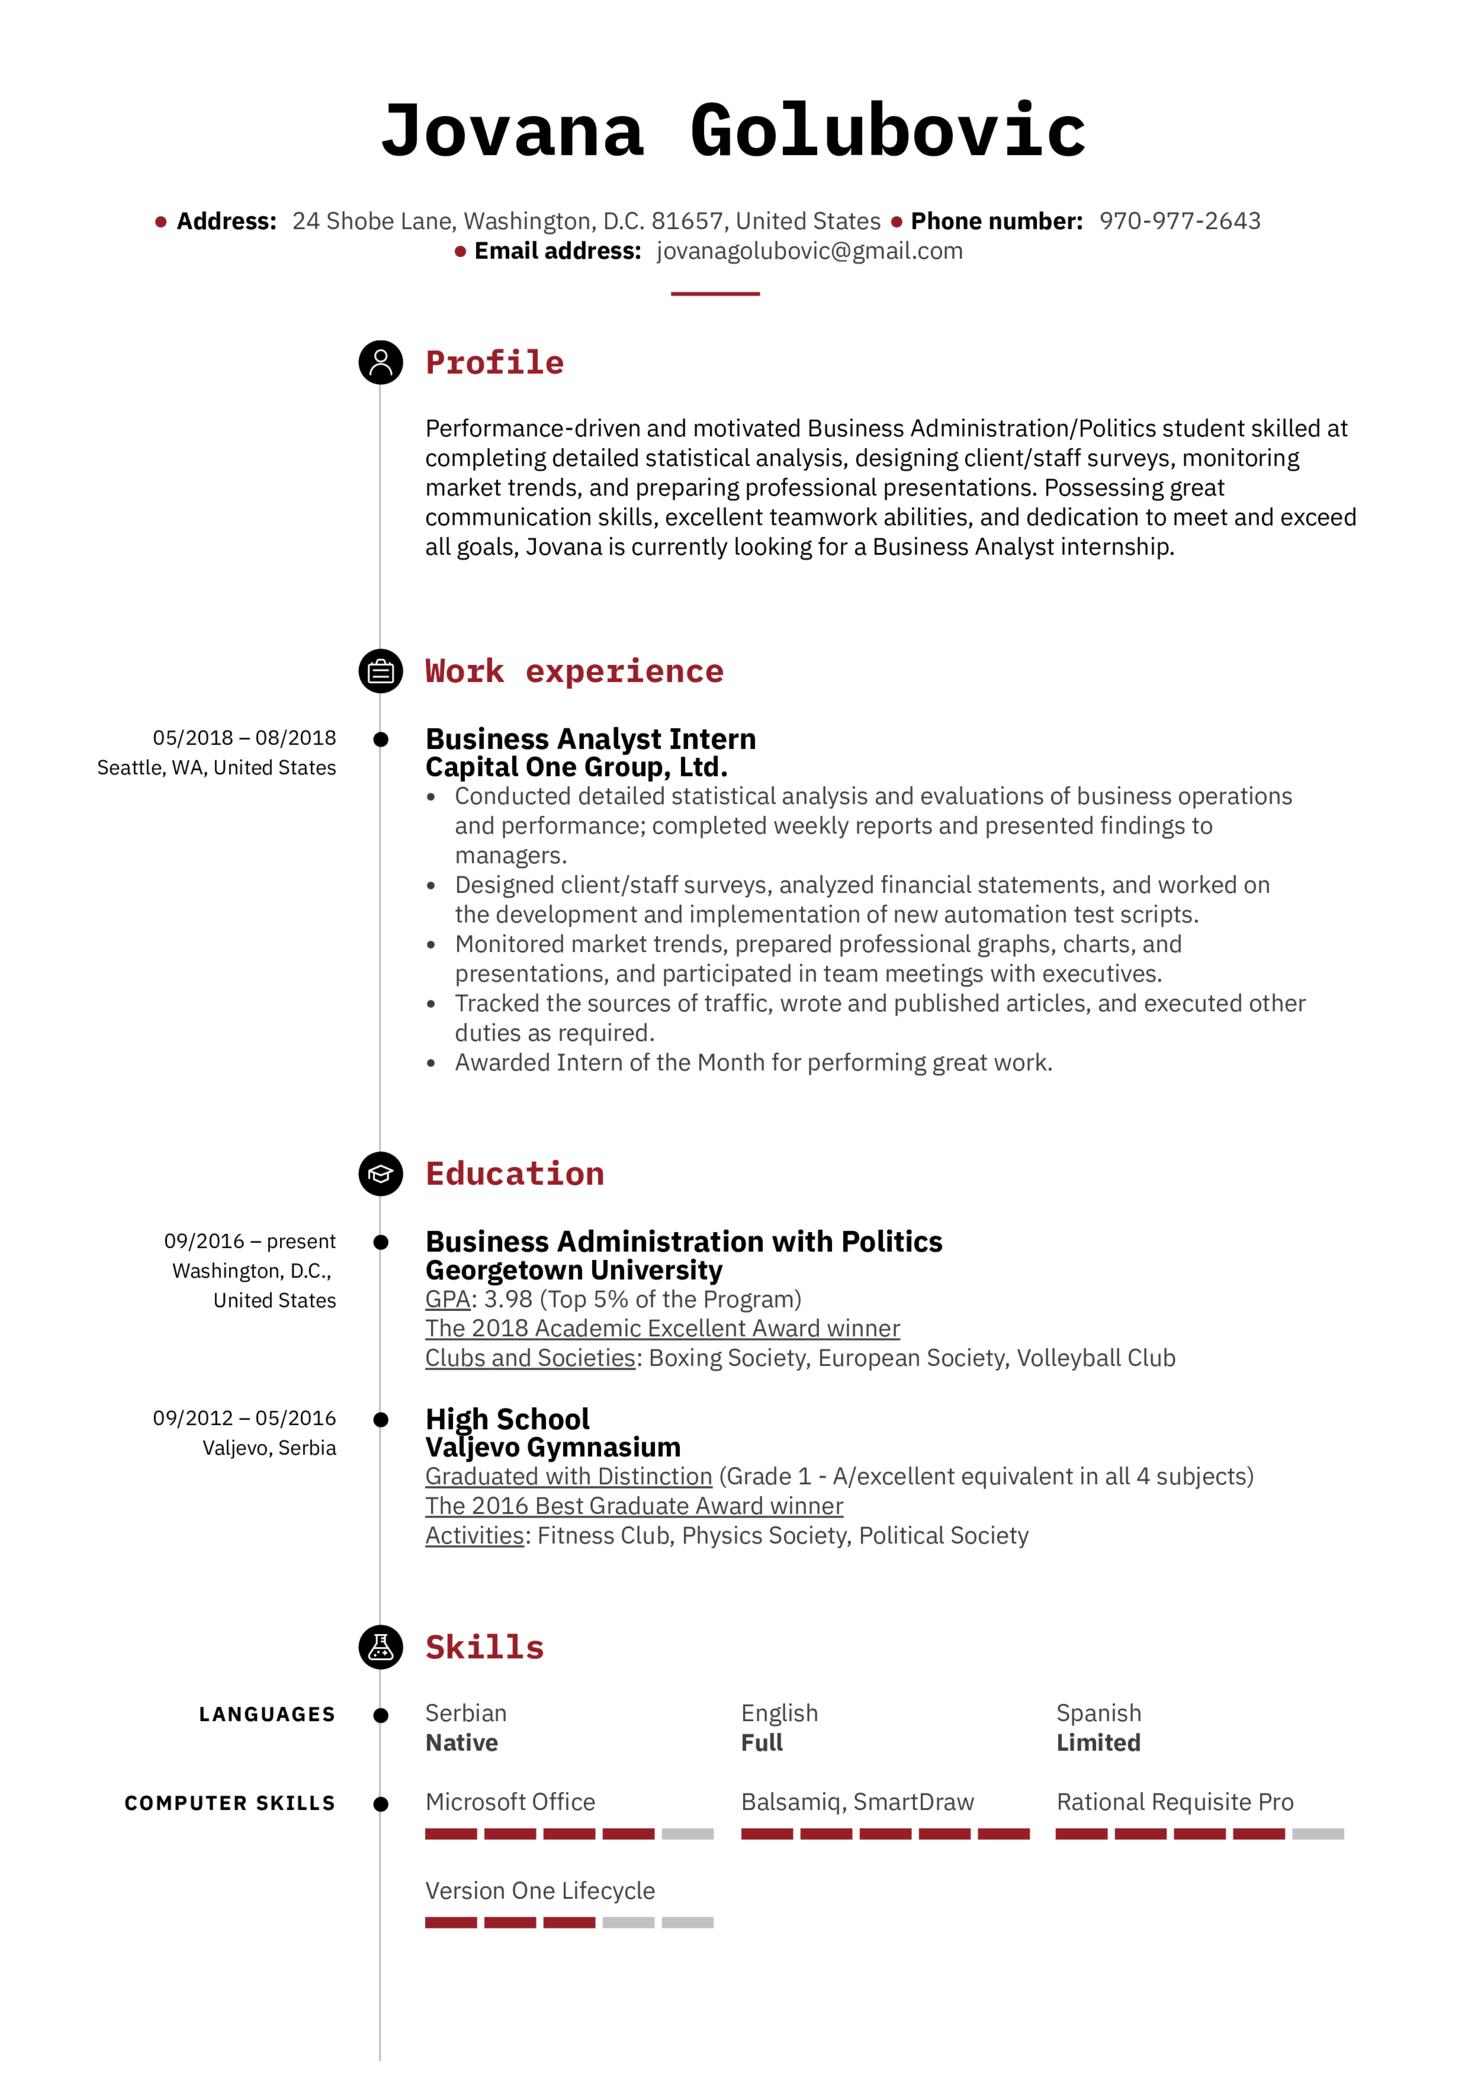 Business Analyst Intern Resume Example (Teil 1)